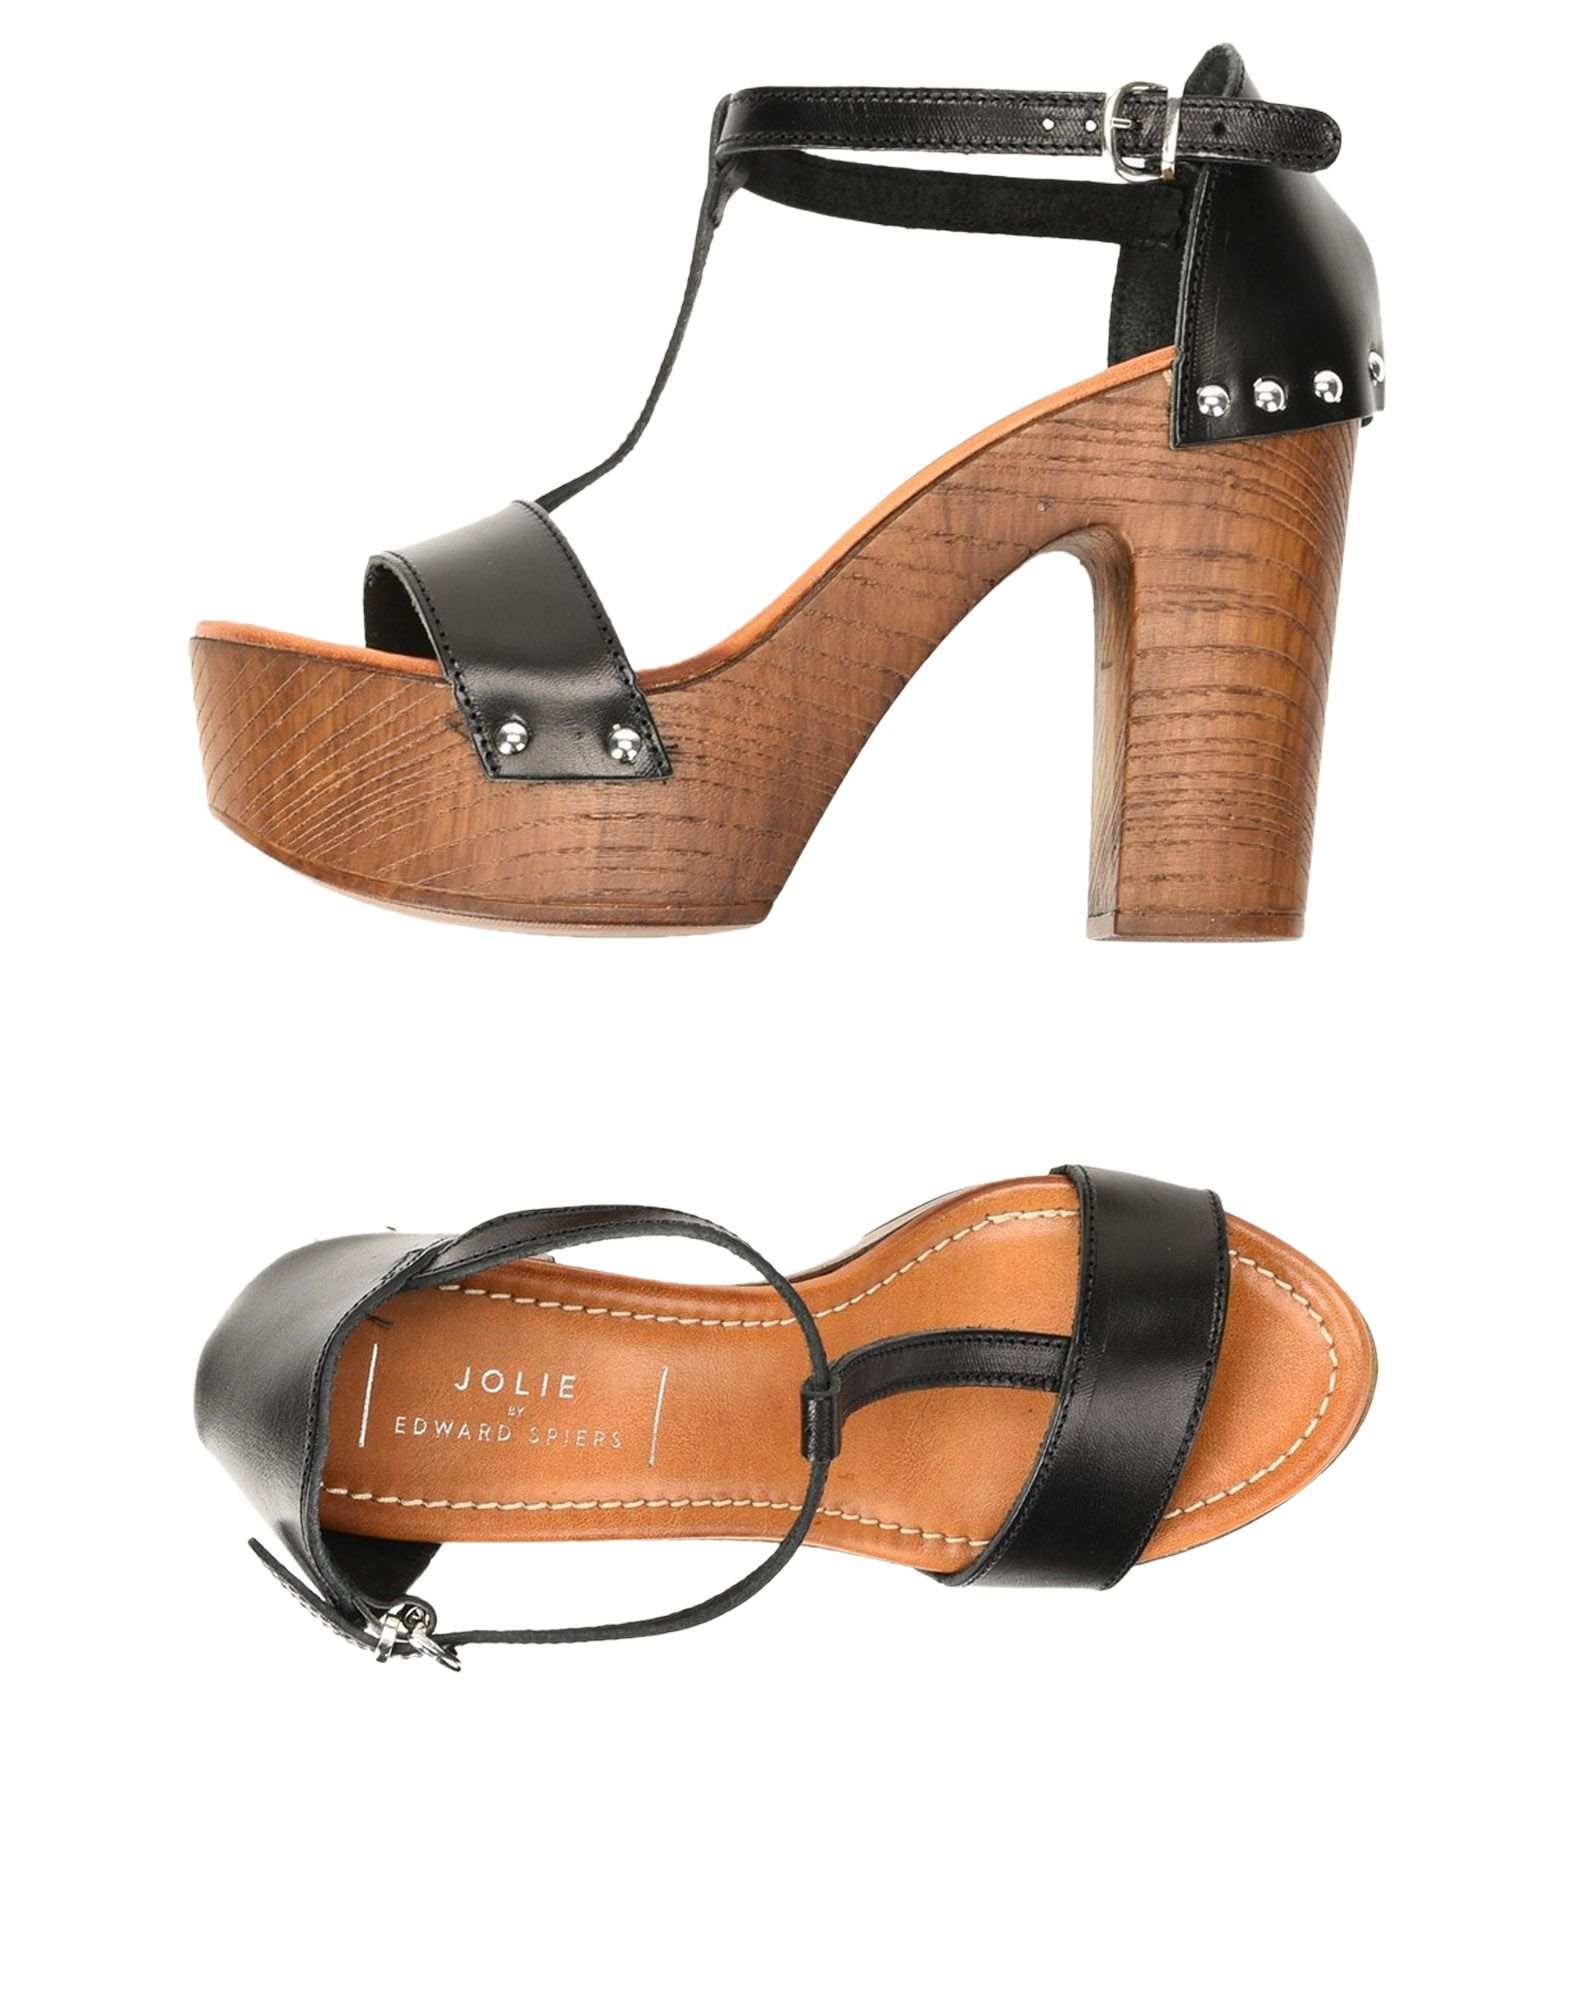 Jolie By Edward Spiers Sandalen Damen  11458352JM Gute Qualität beliebte Schuhe